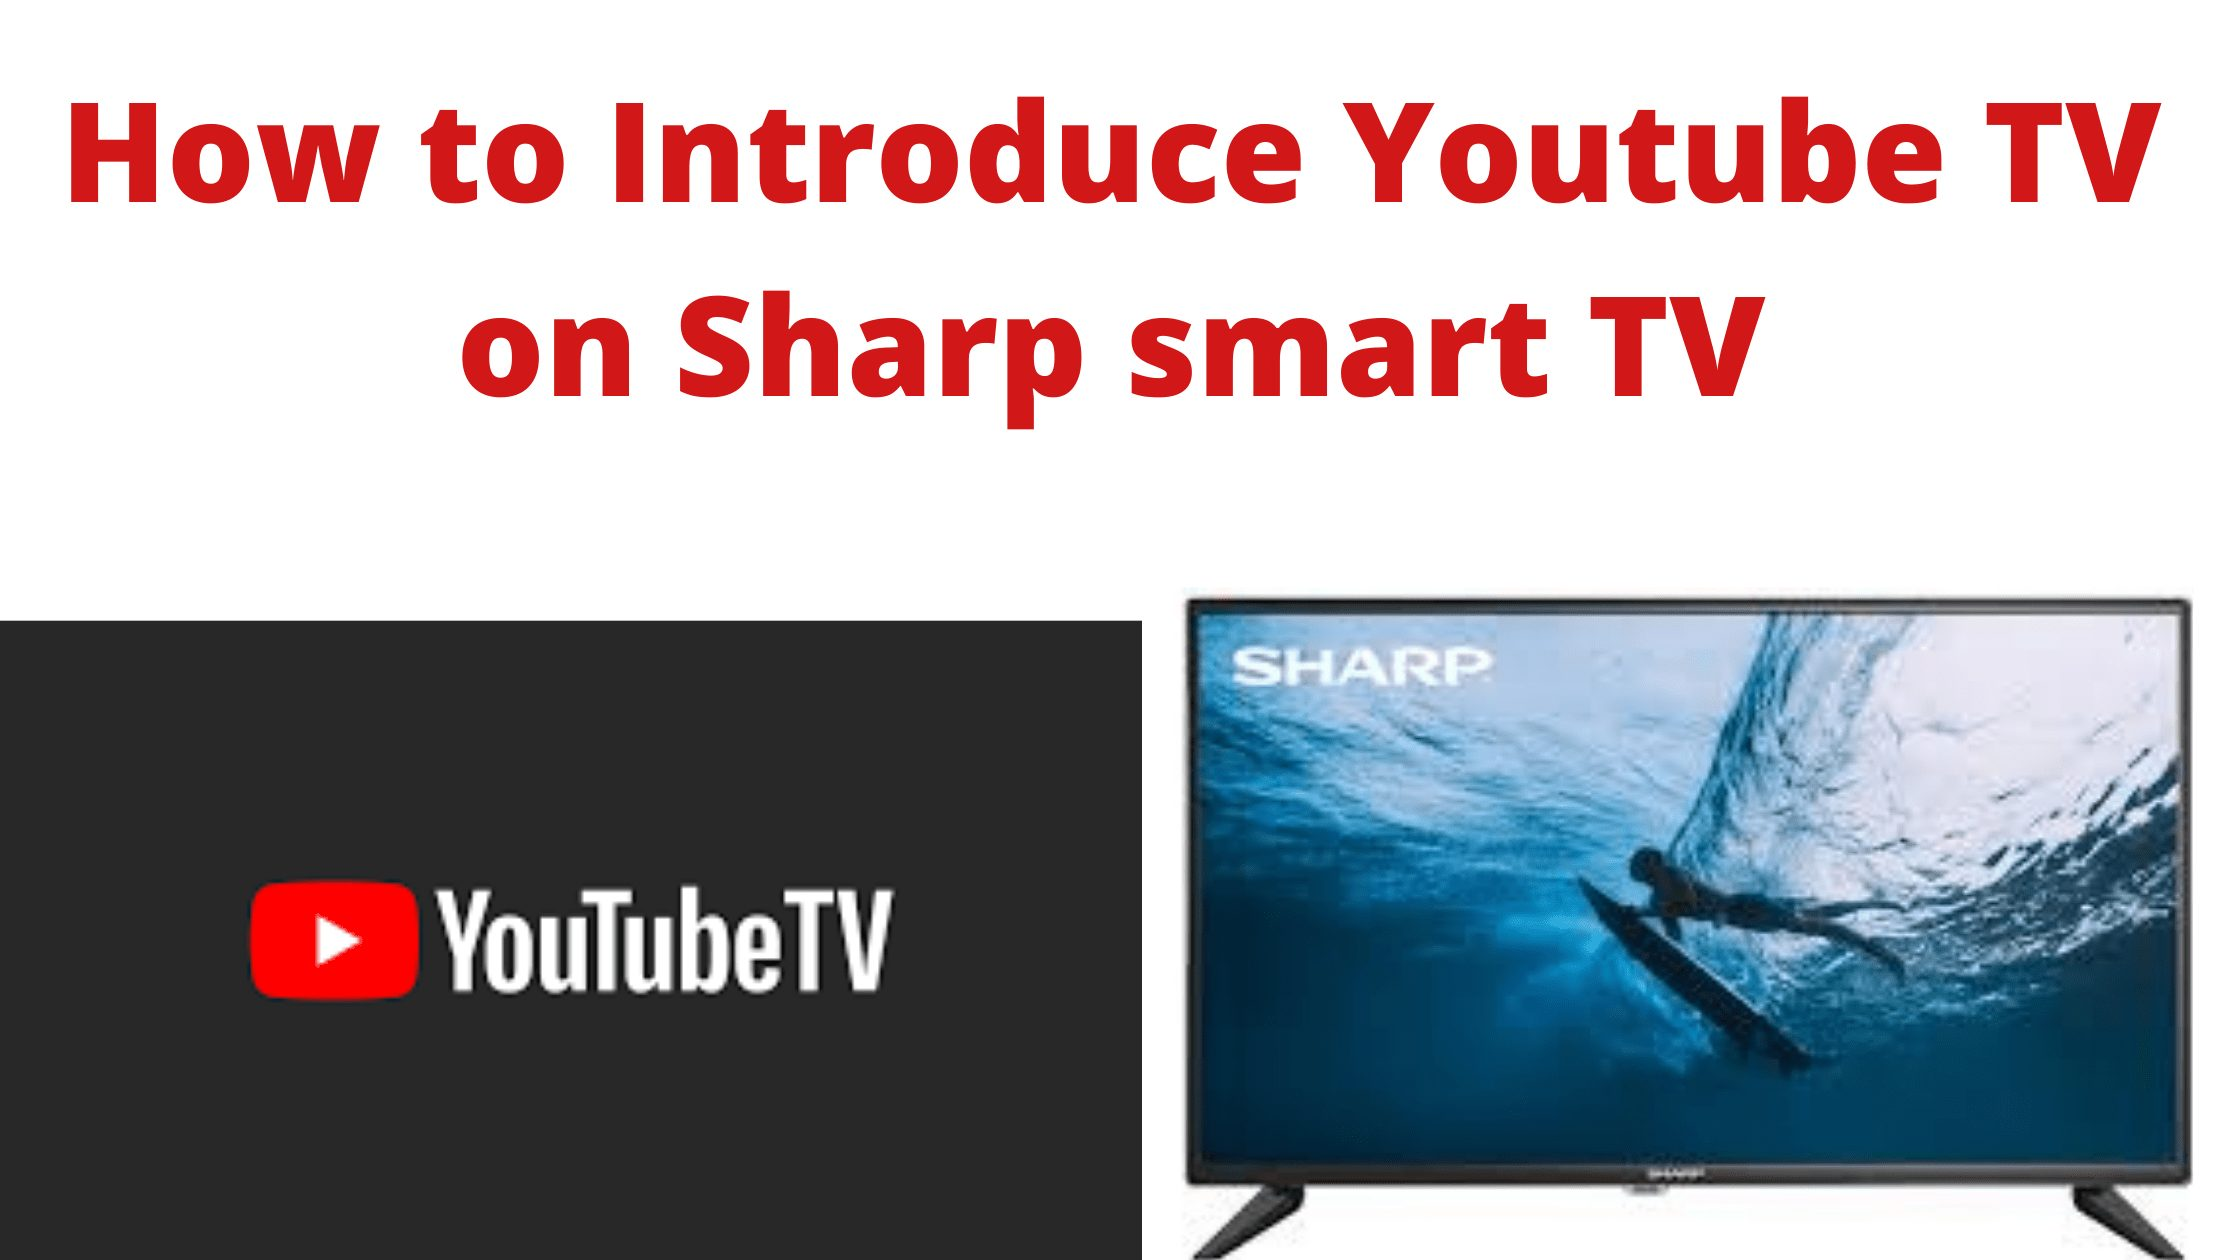 Youtube TV on Sharp smart TV